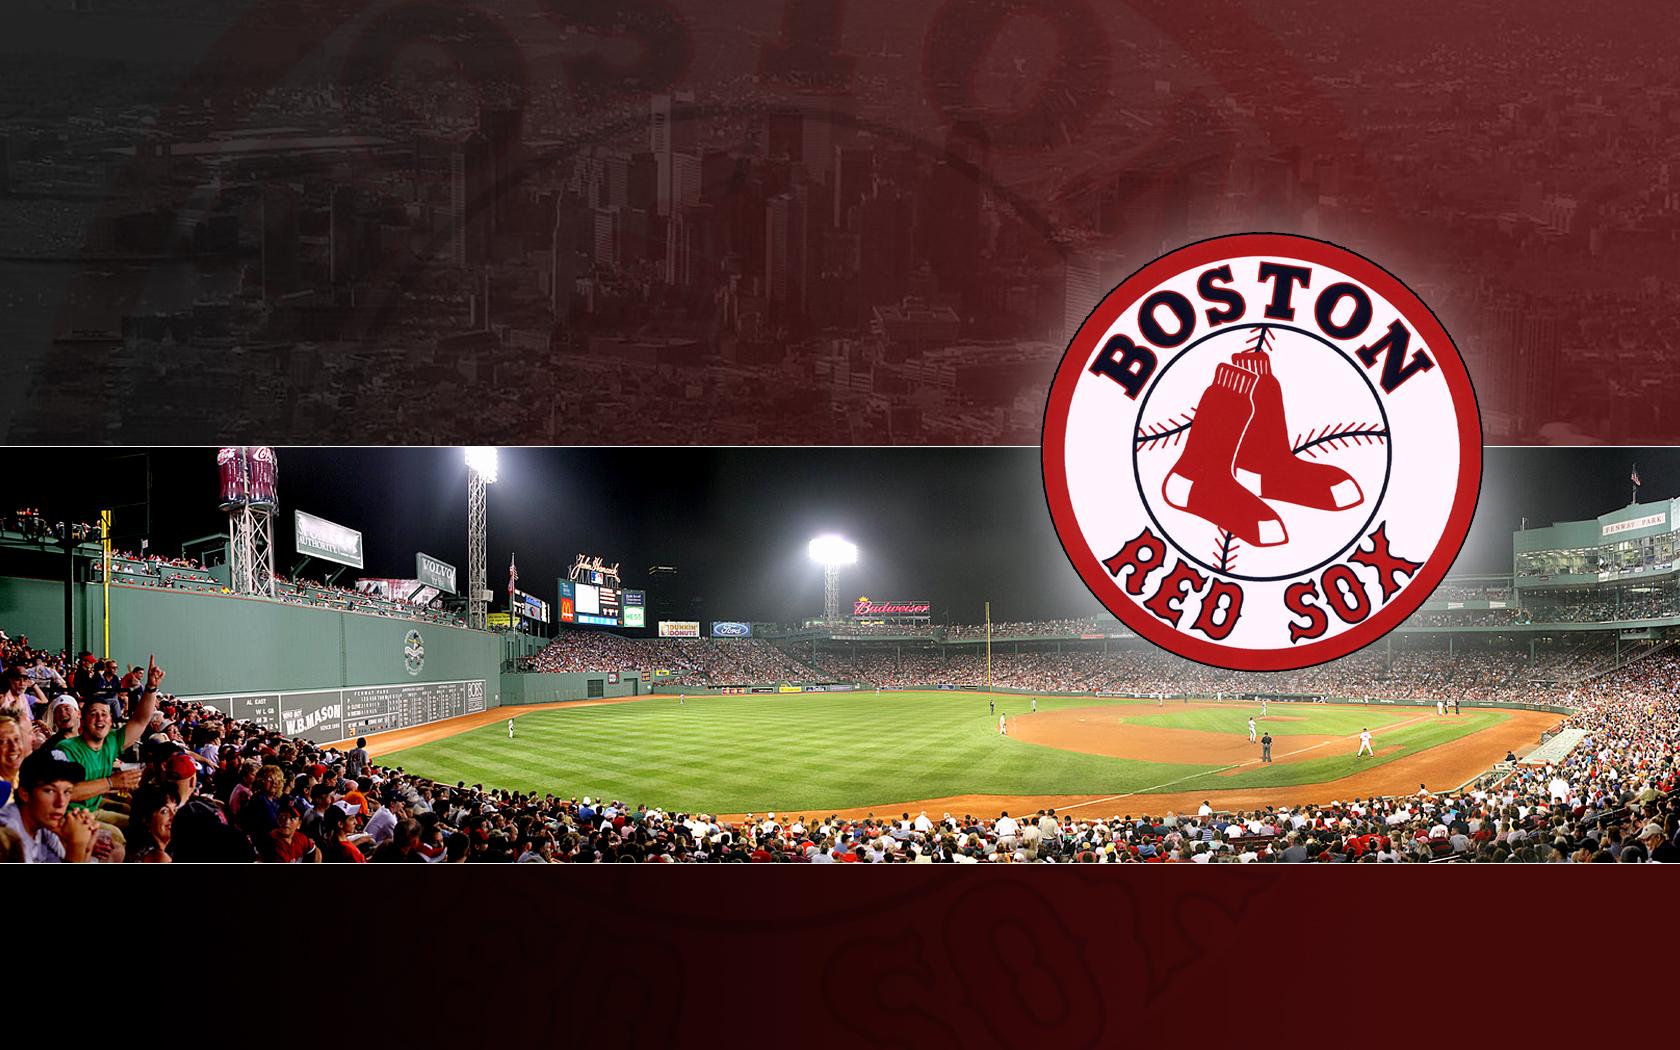 Boston Red Sox Wallpaper 8   1680 X 1050 stmednet 1680x1050